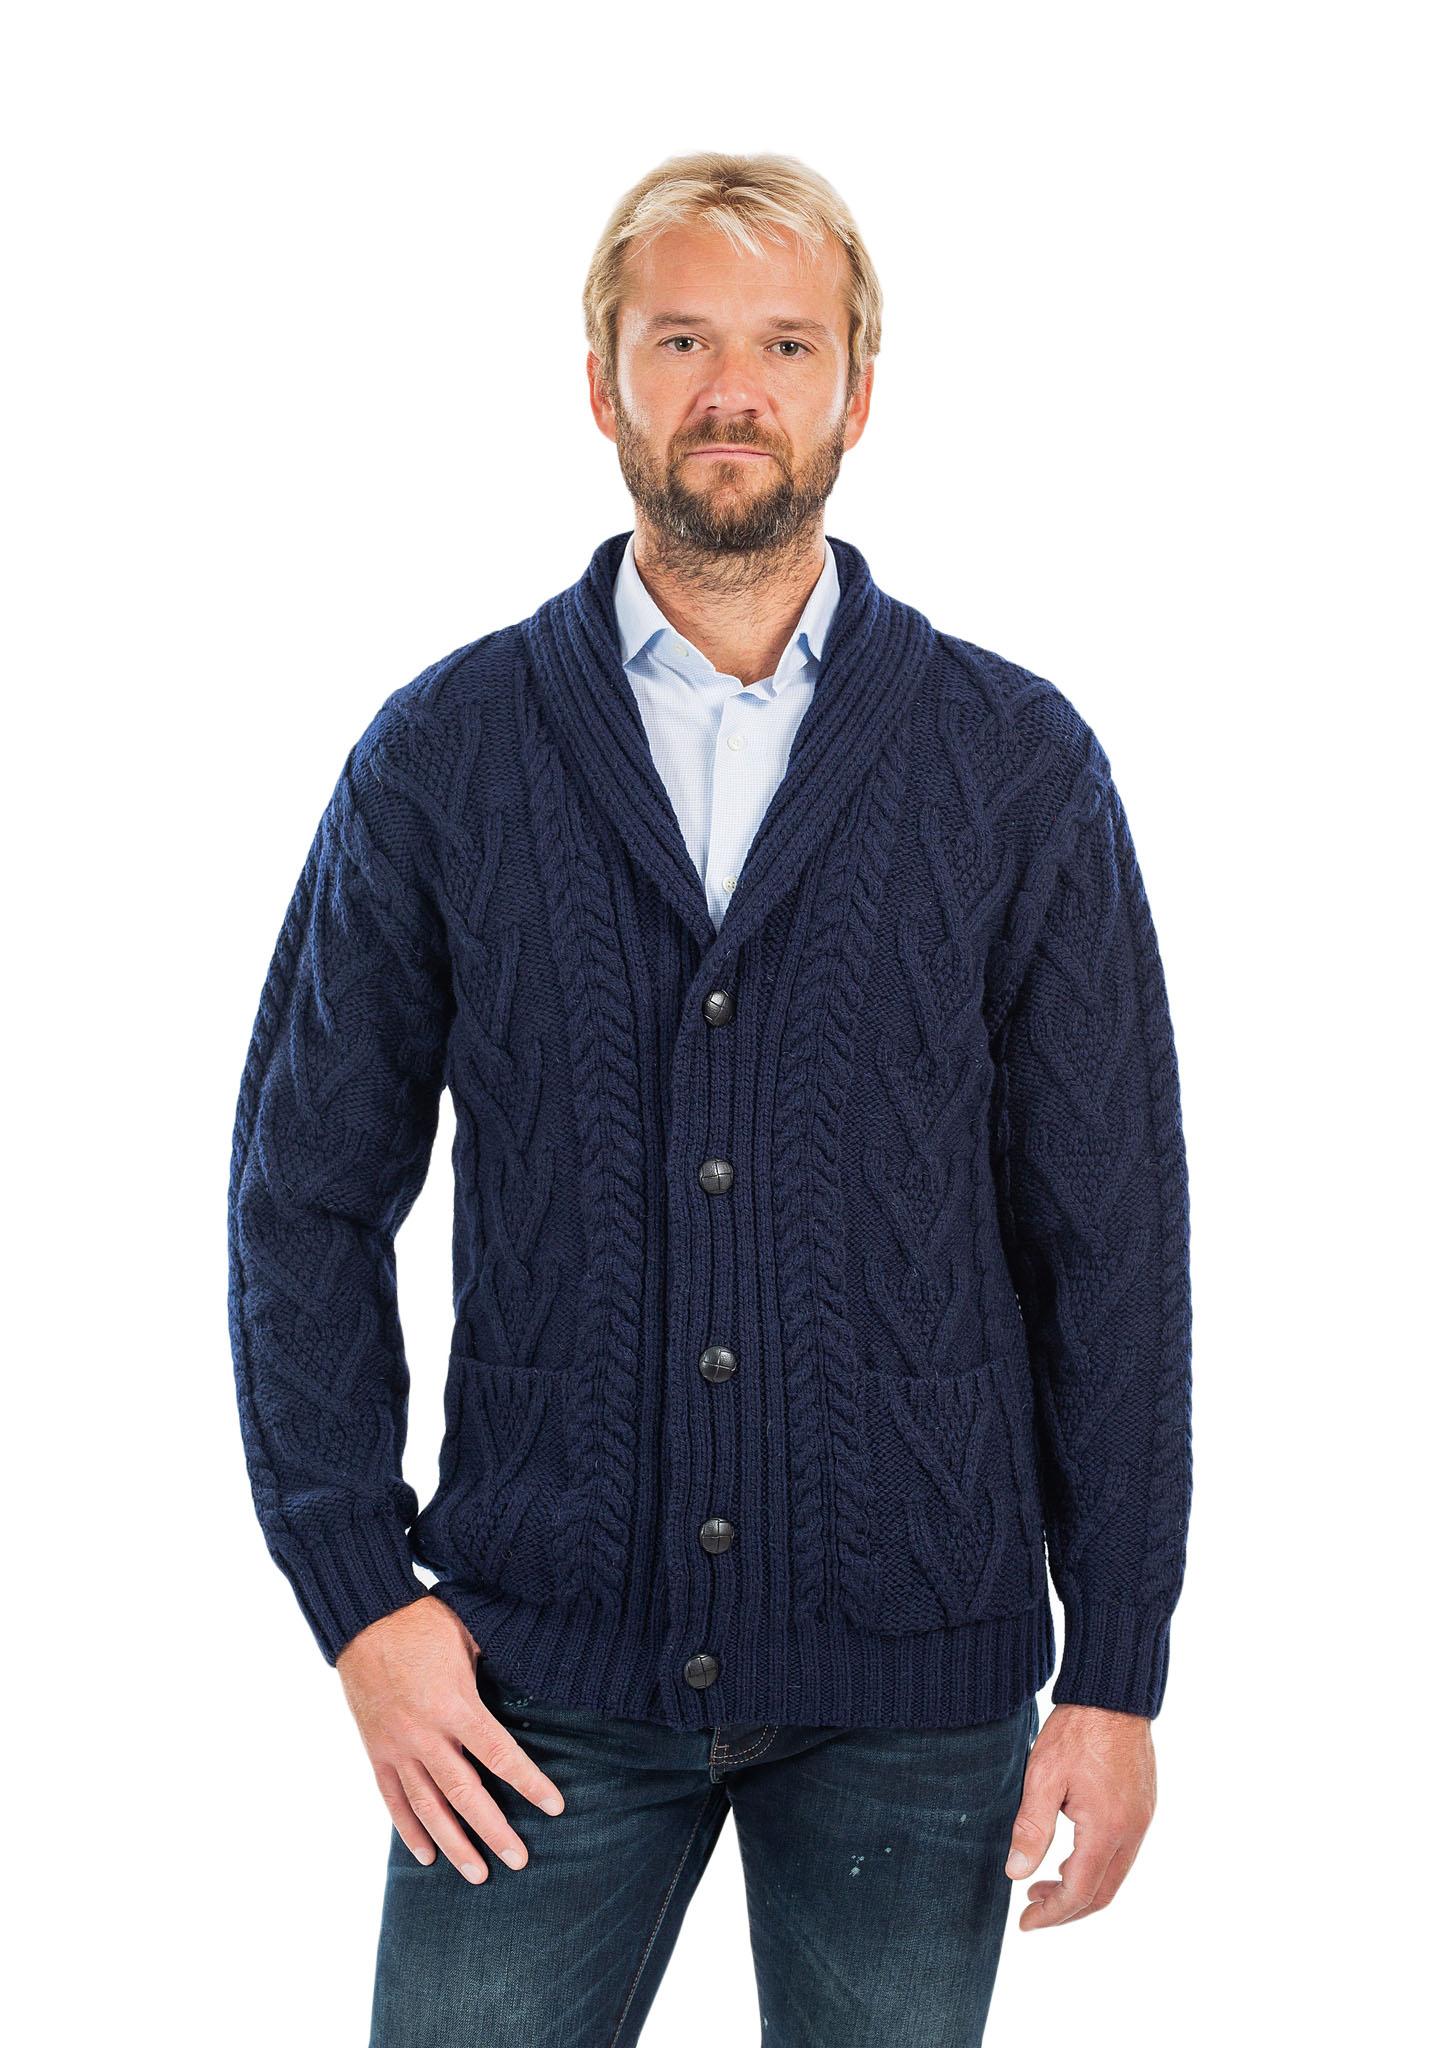 SAOL-Mens-Irish-Merino-Wool-Cardigan-Shawl-Collar-Front-Pockets-Aran-Cable-Knit thumbnail 26